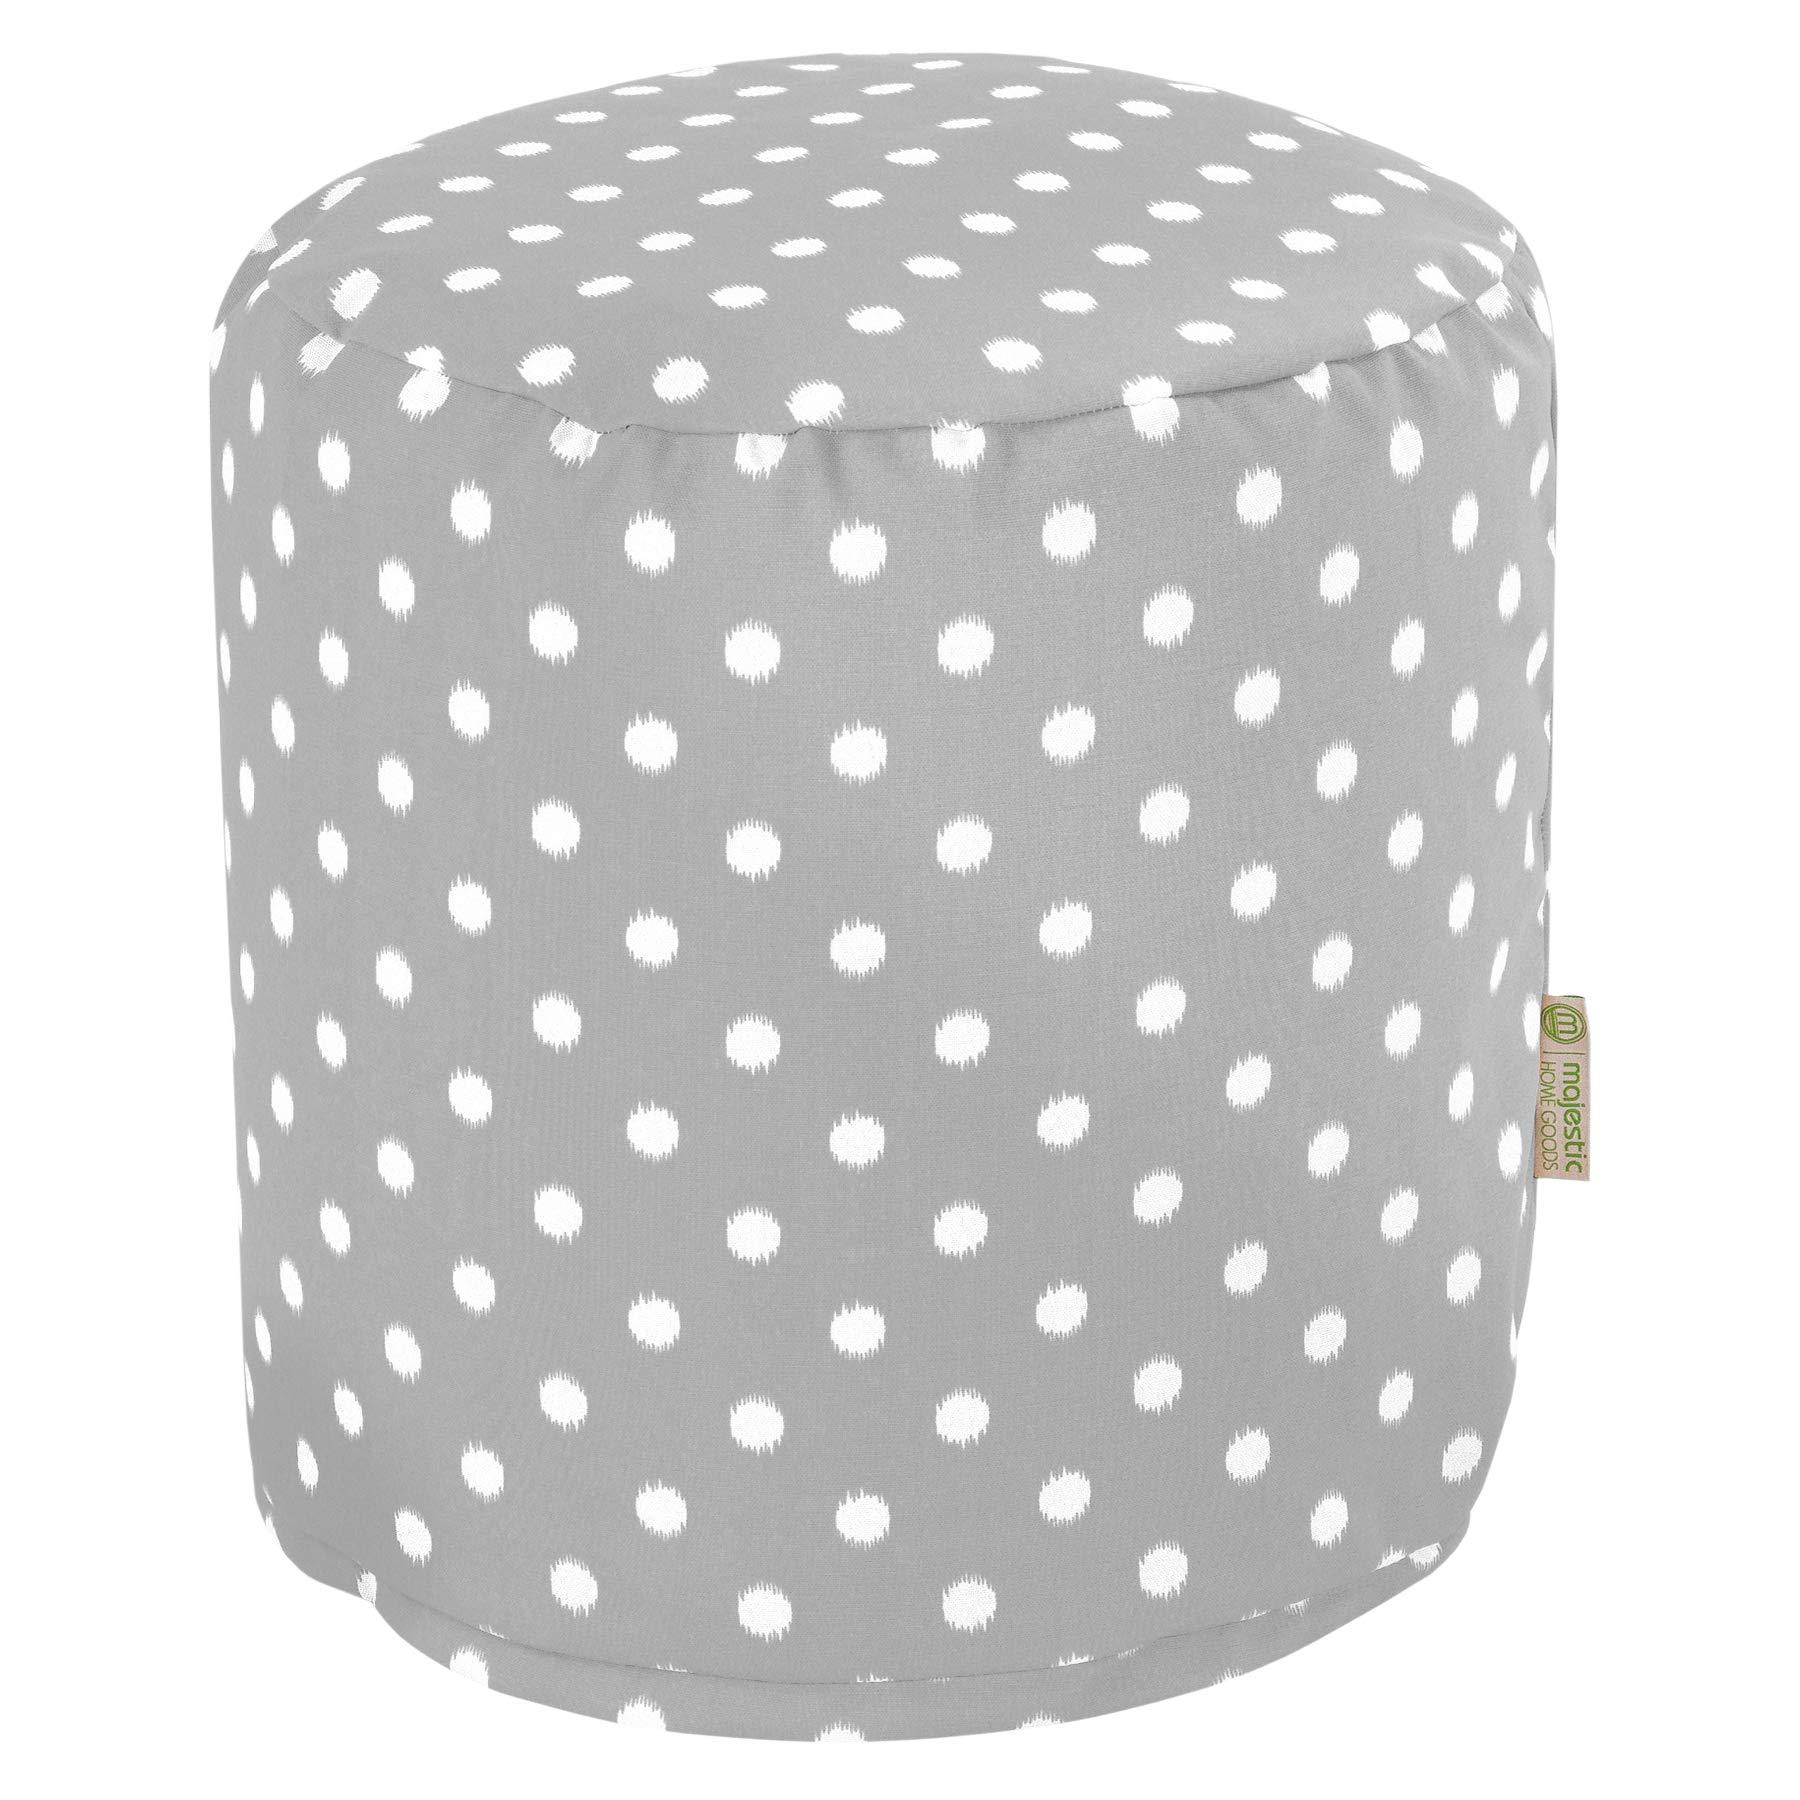 Majestic Home Goods Gray Ikat Dot Indoor/Outdoor Bean Bag Ottoman Pouf 16'' L x 16'' W x 17'' H